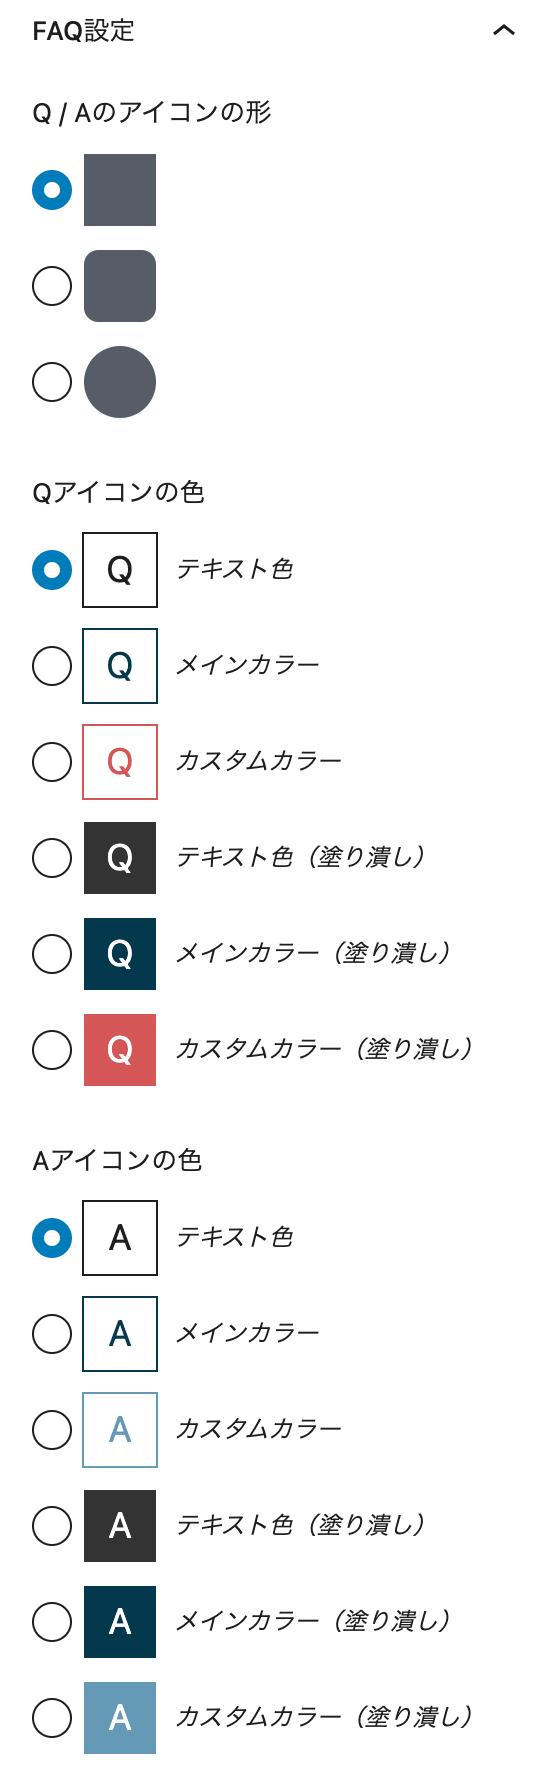 FAQ専用の設定項目